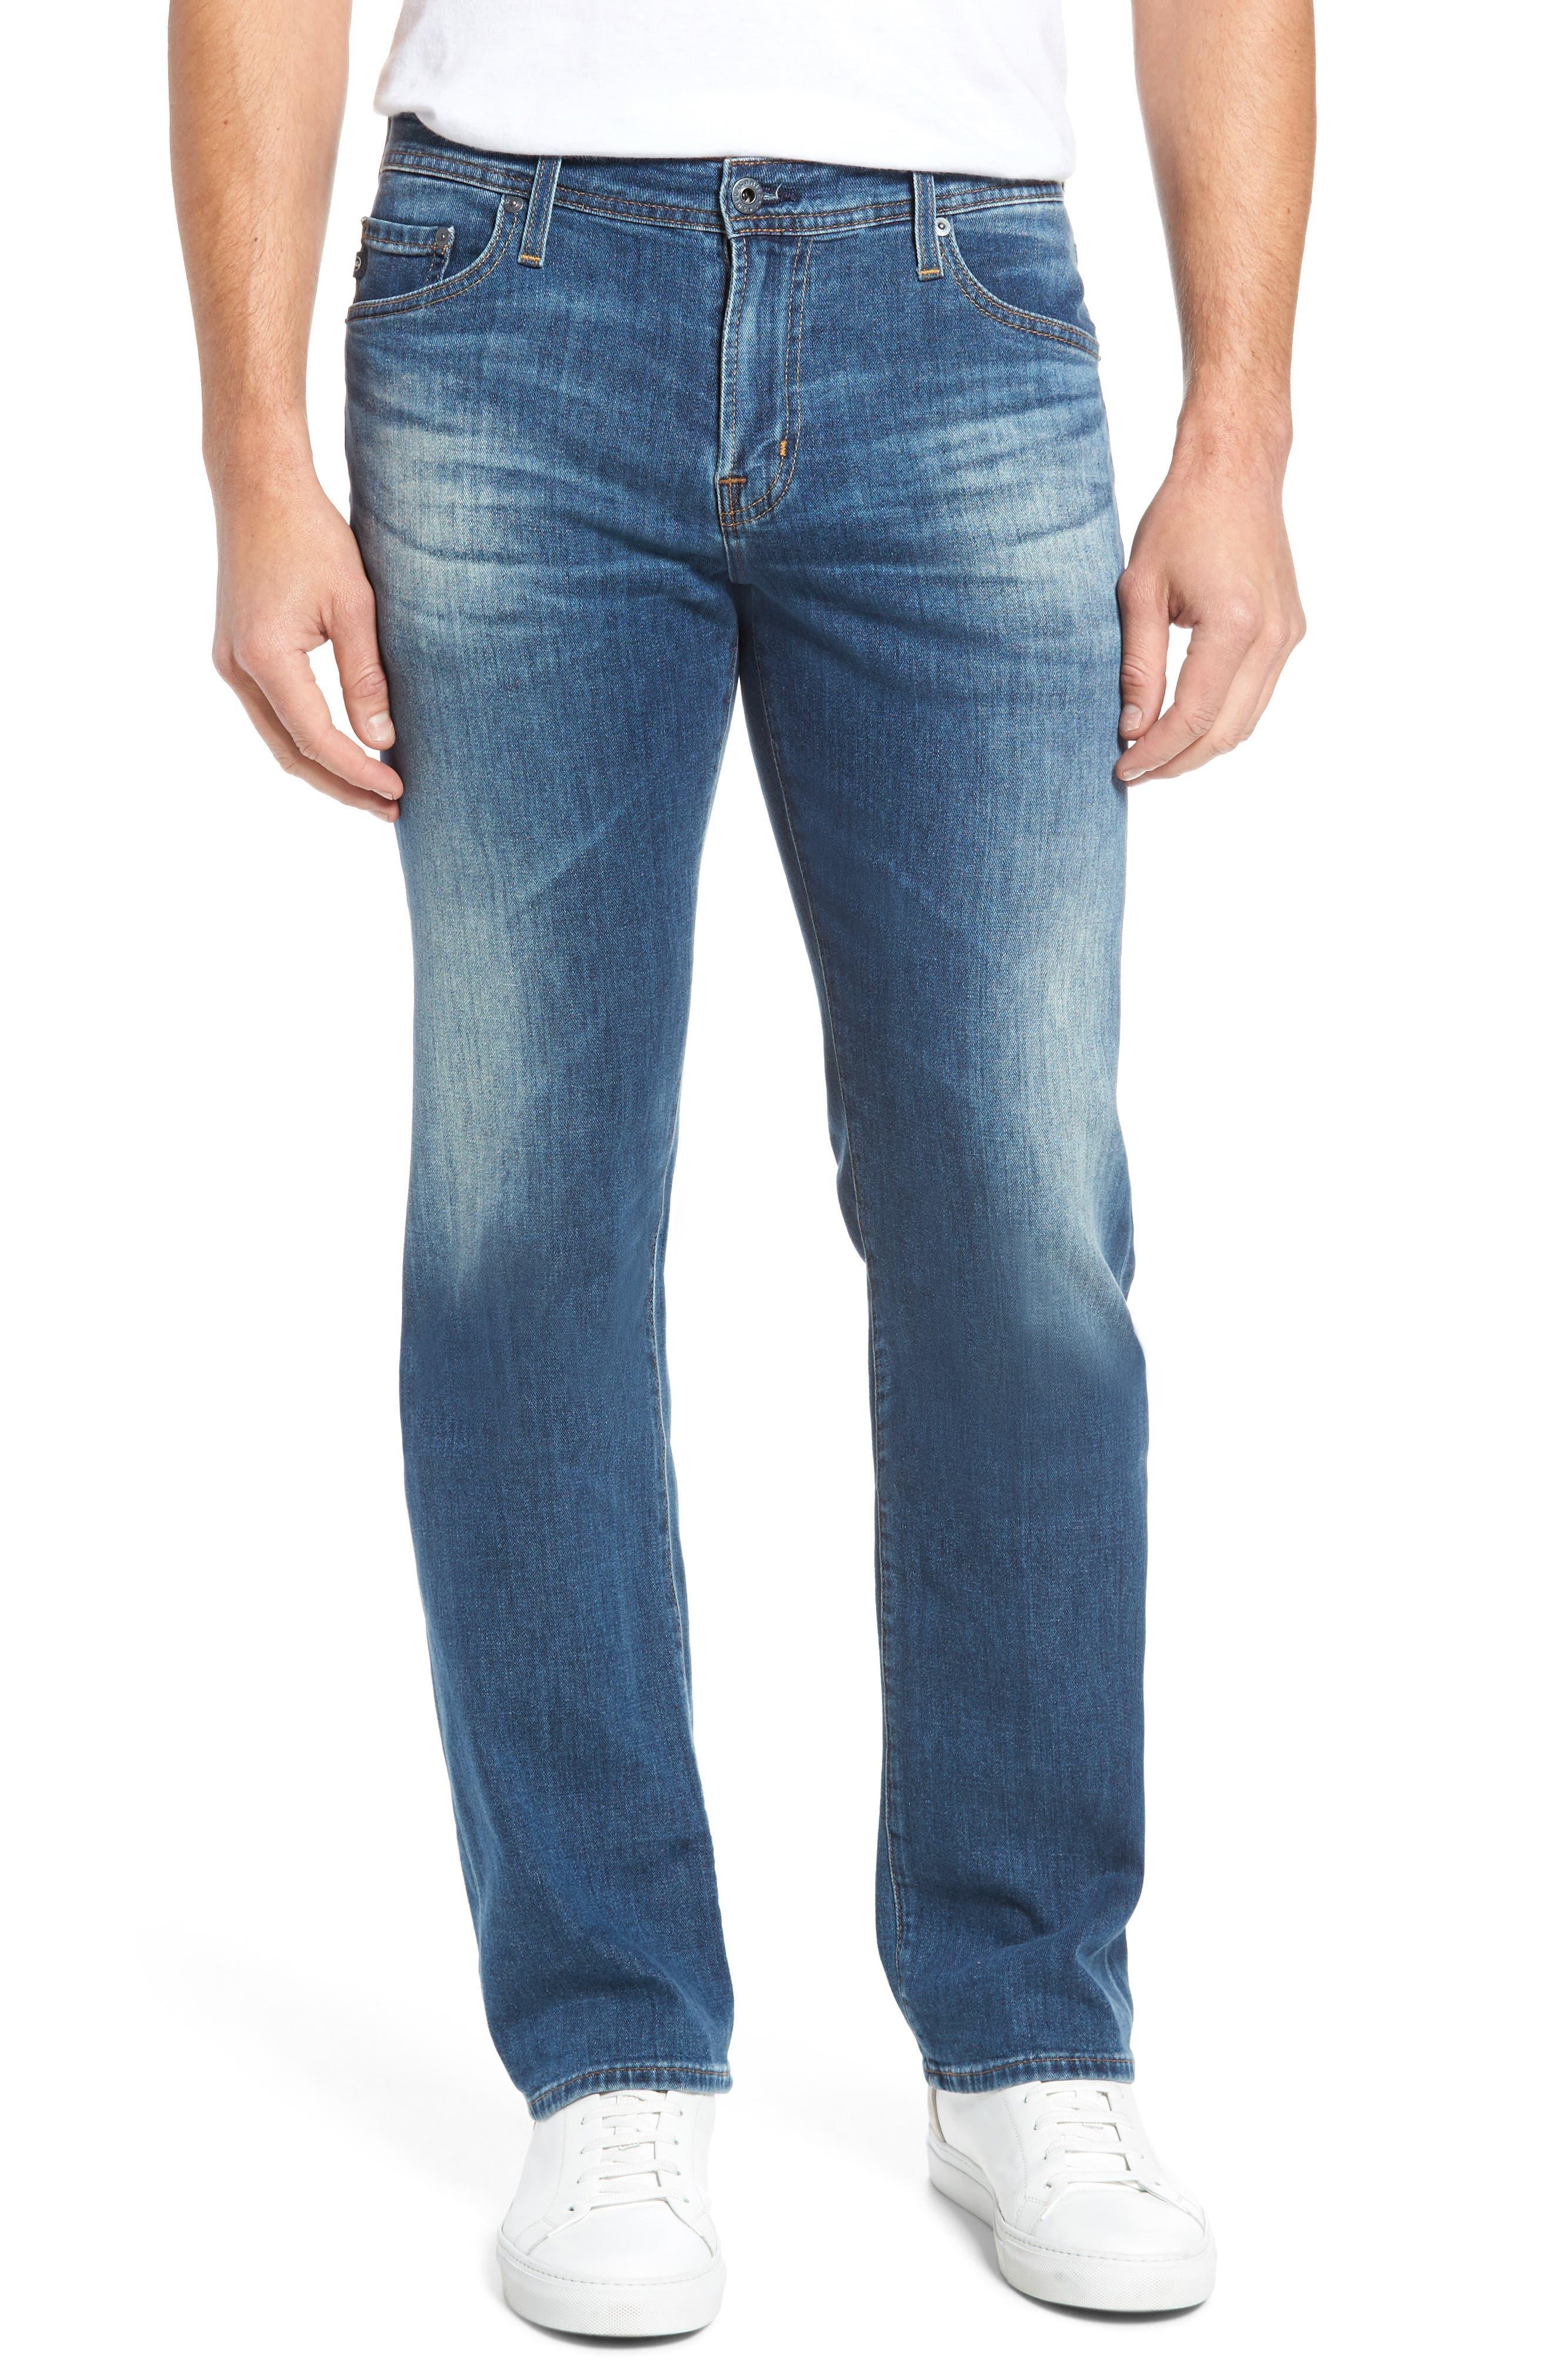 Main Image - AG Protégé Relaxed Fit Jeans (Four Rivers)